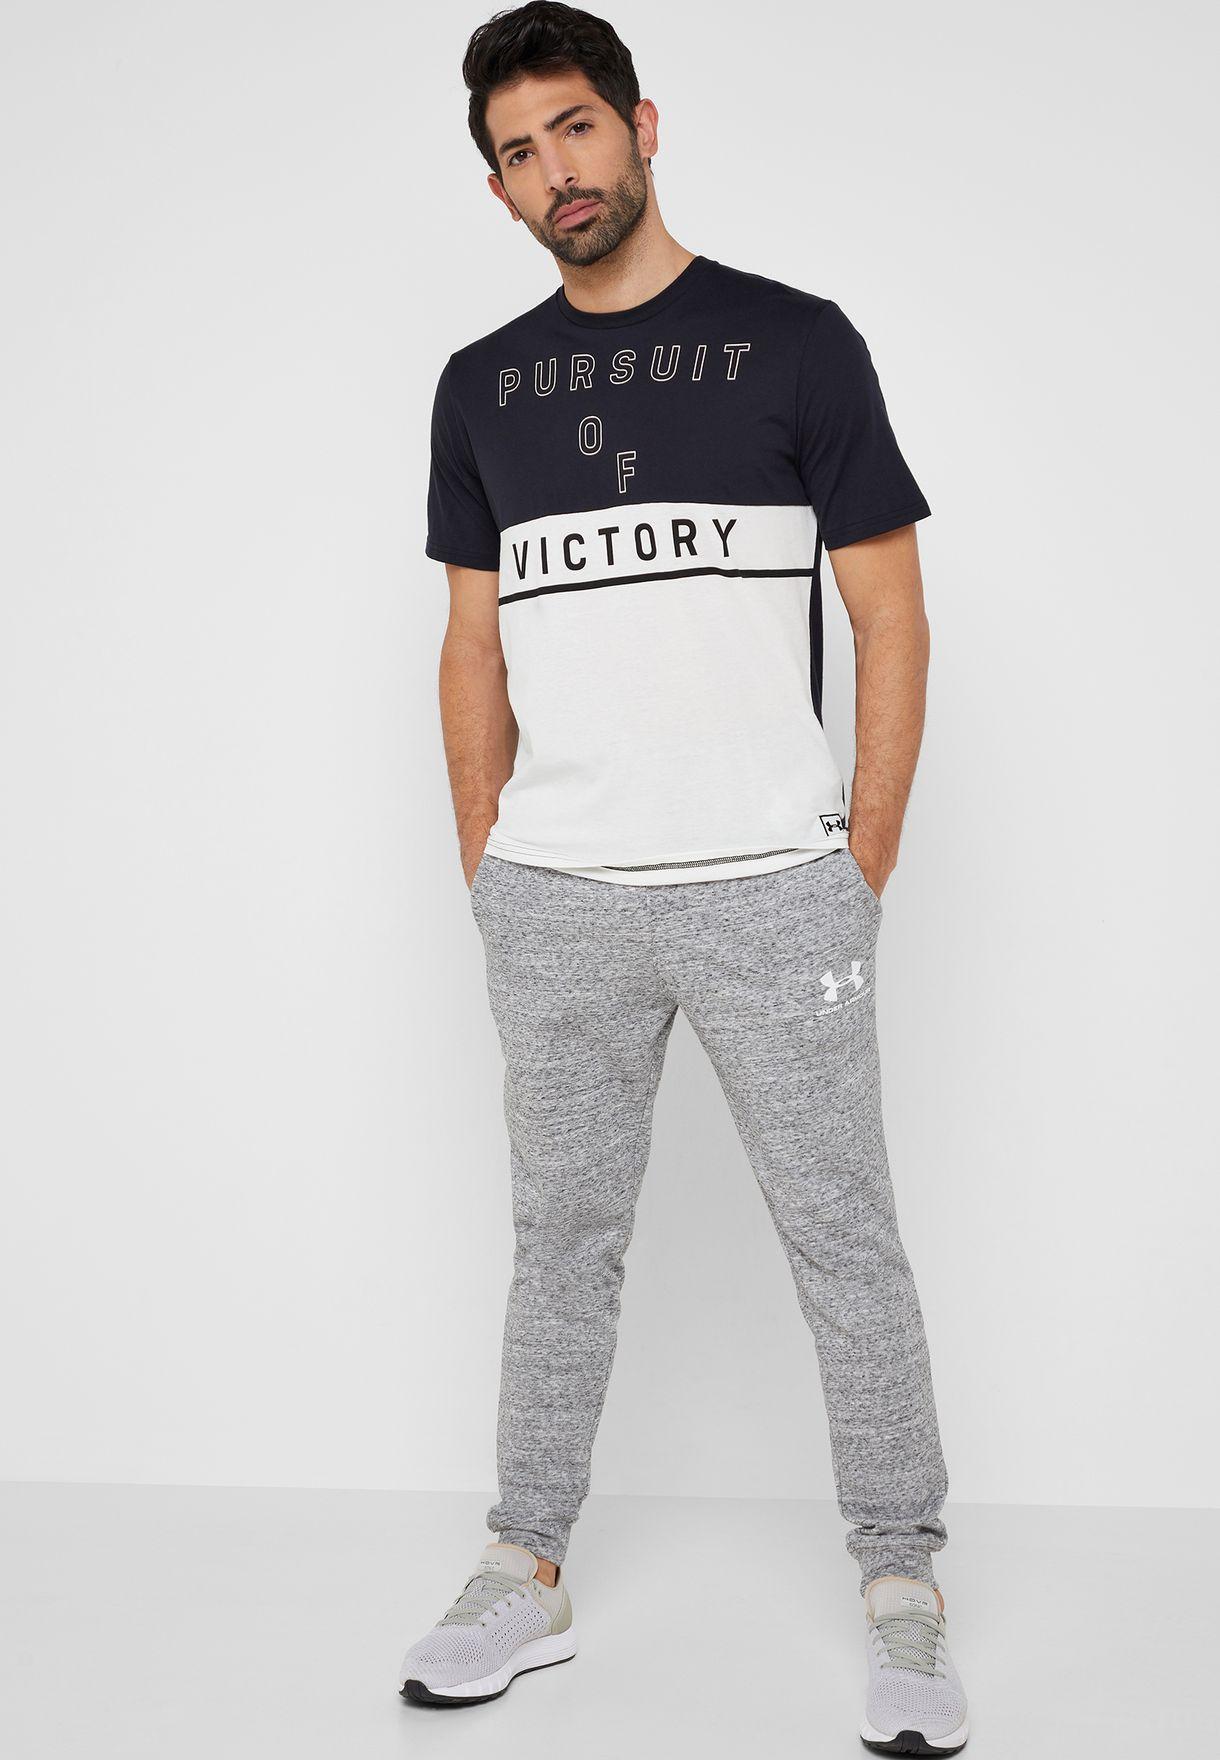 Pursuit Of Victory T-Shirt